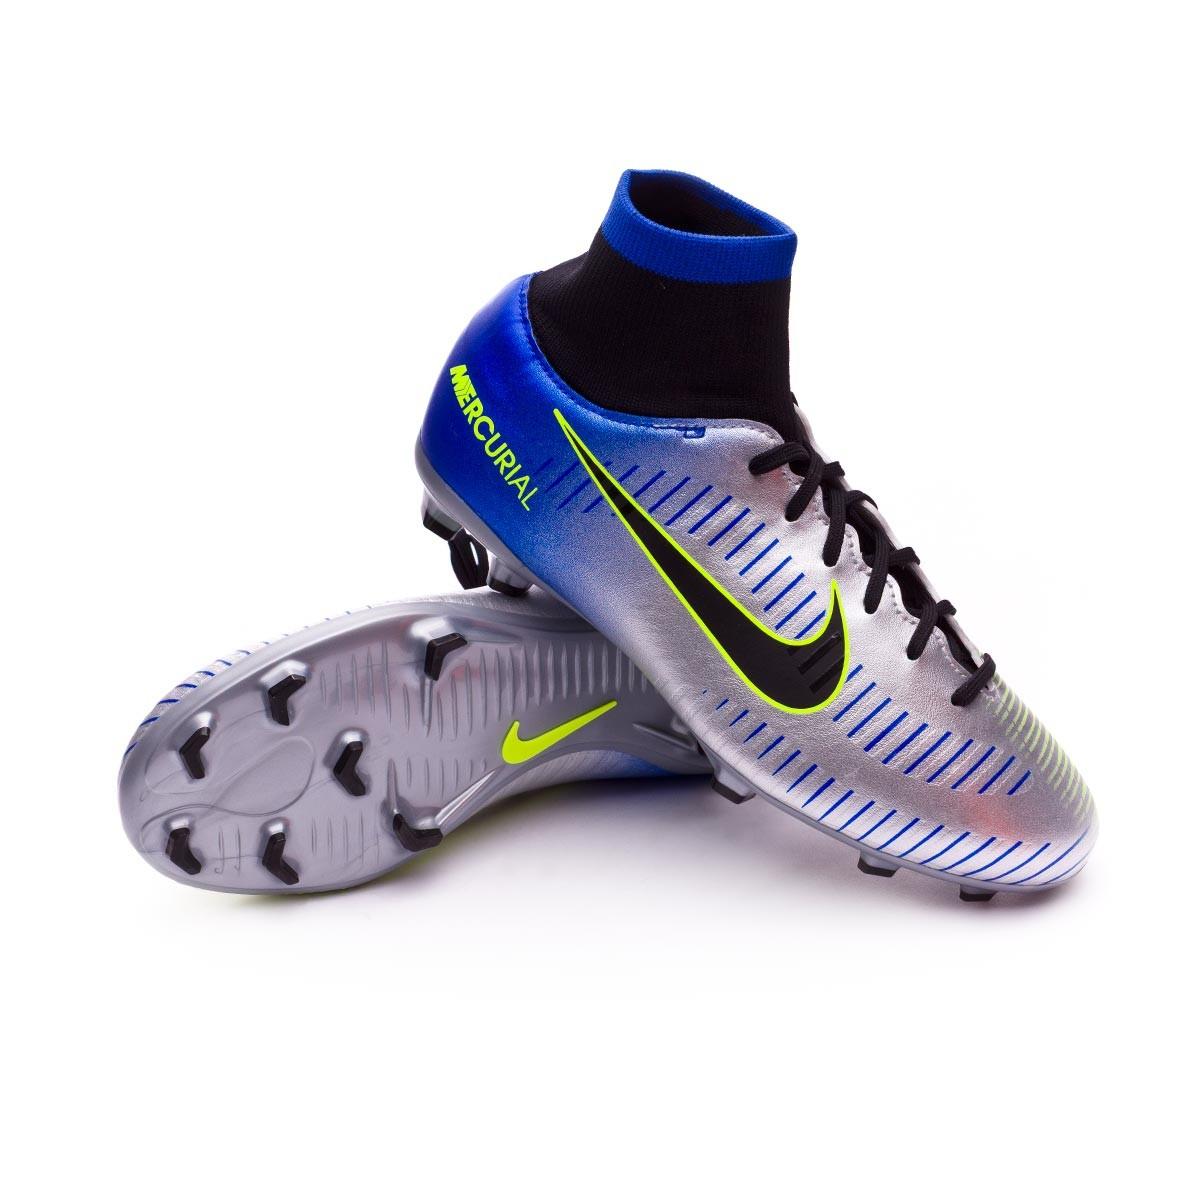 ce591f701c481 Football Boots Nike Kids Mercurial Victory VI DF FG Neymar Racer ...